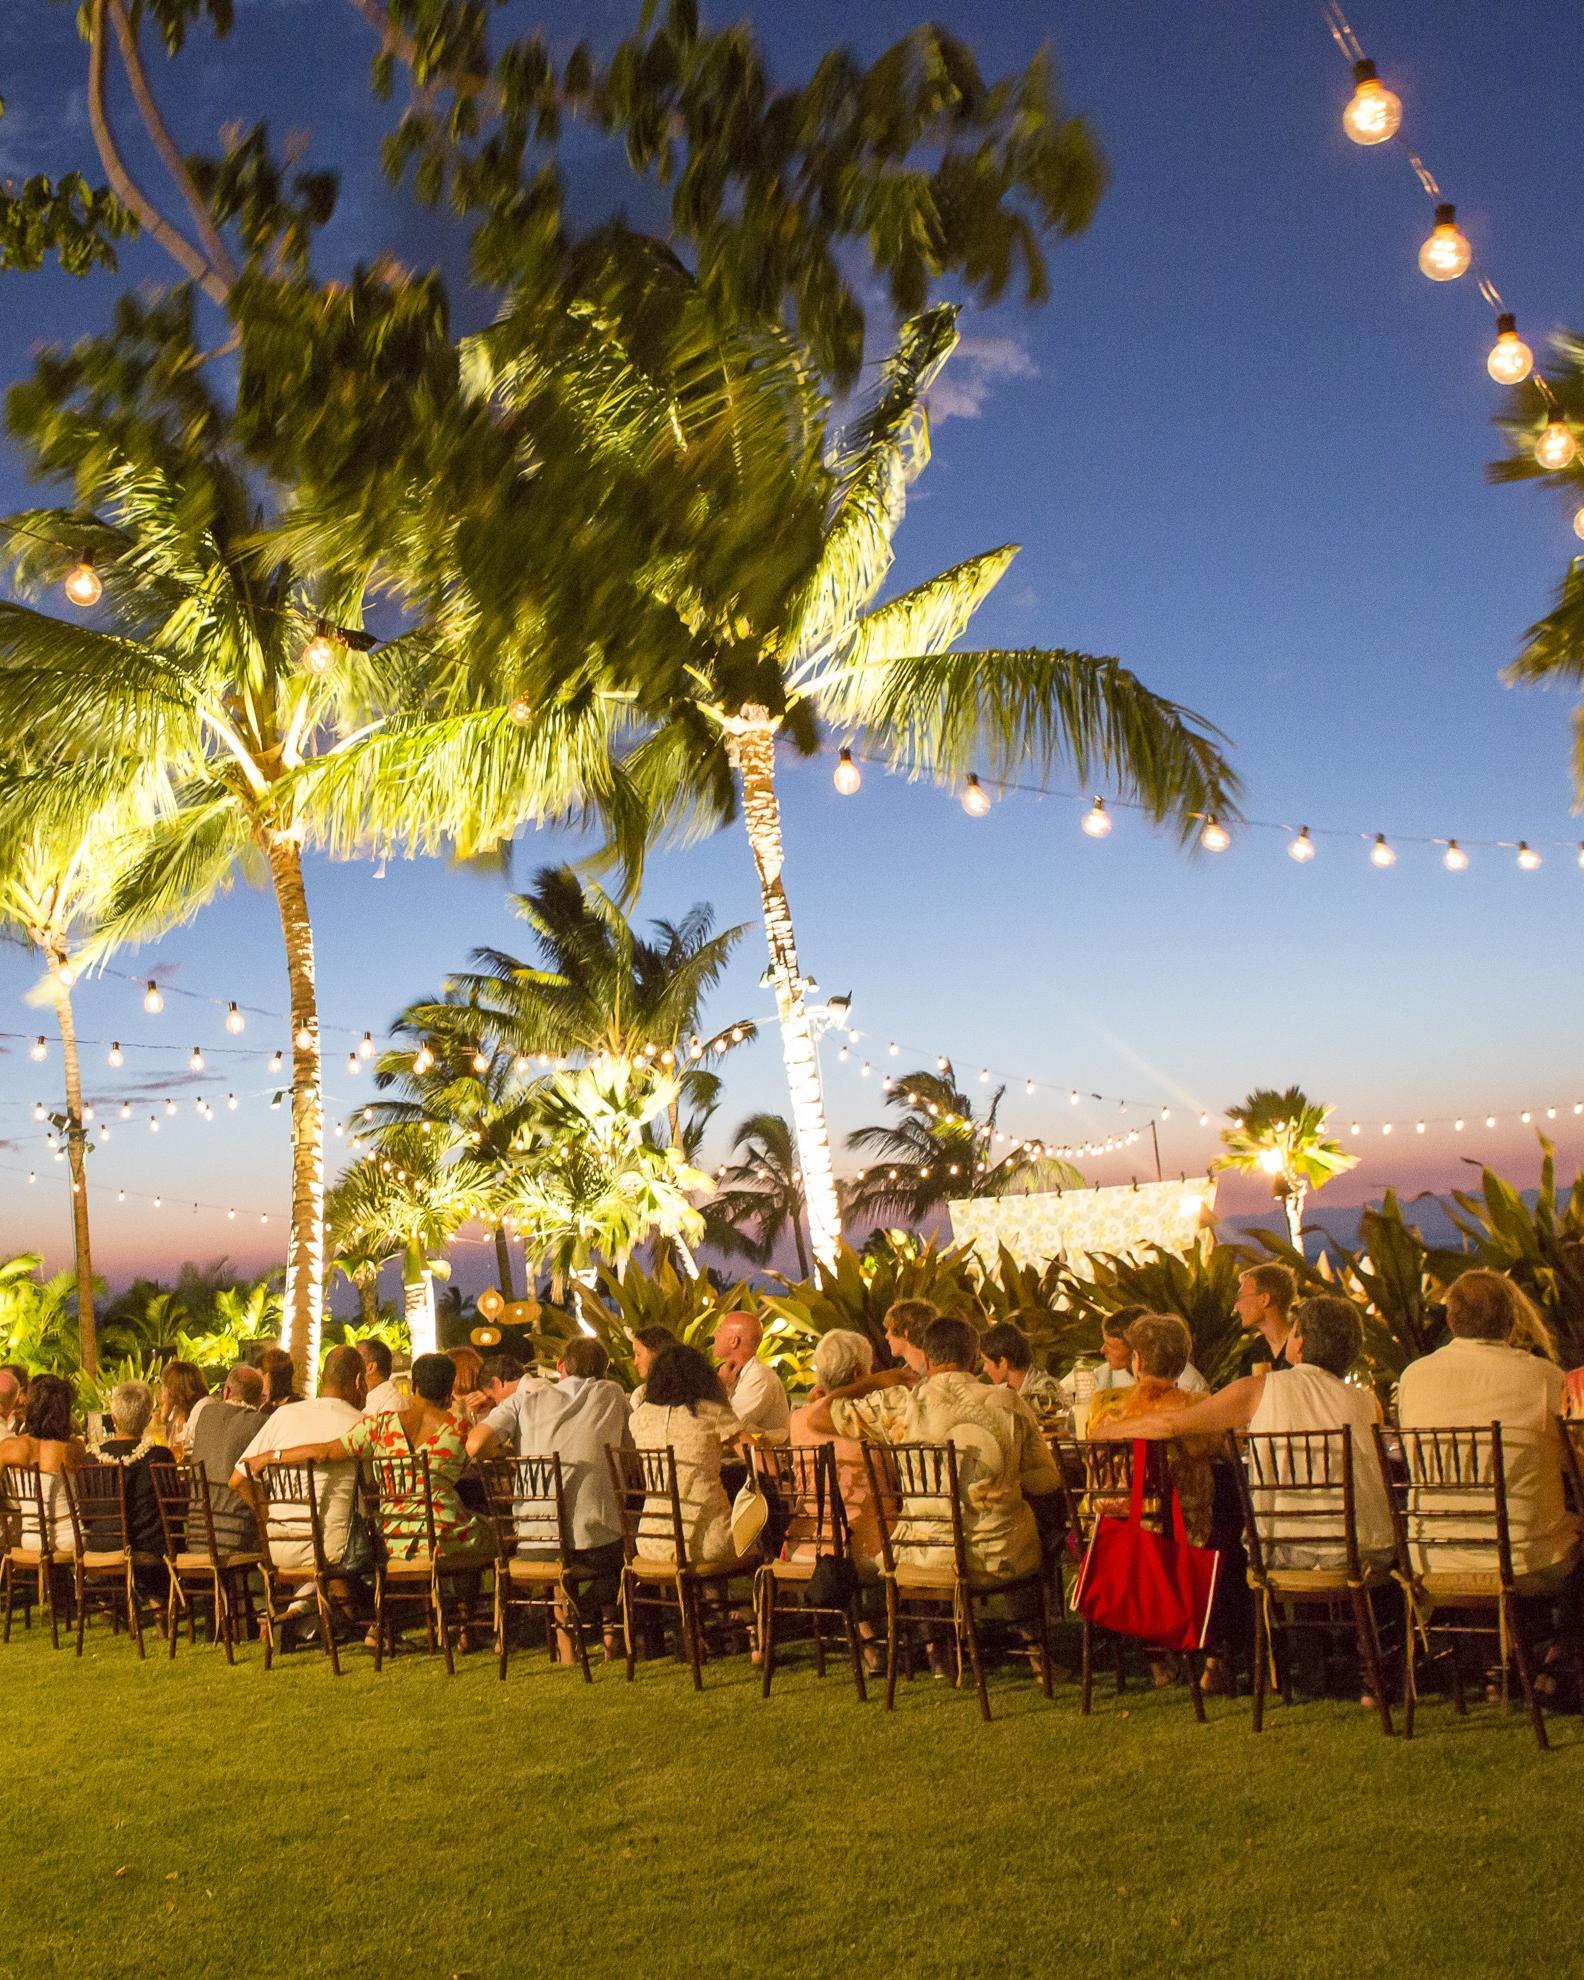 11-rebecca-reategui-hawaiii-0815